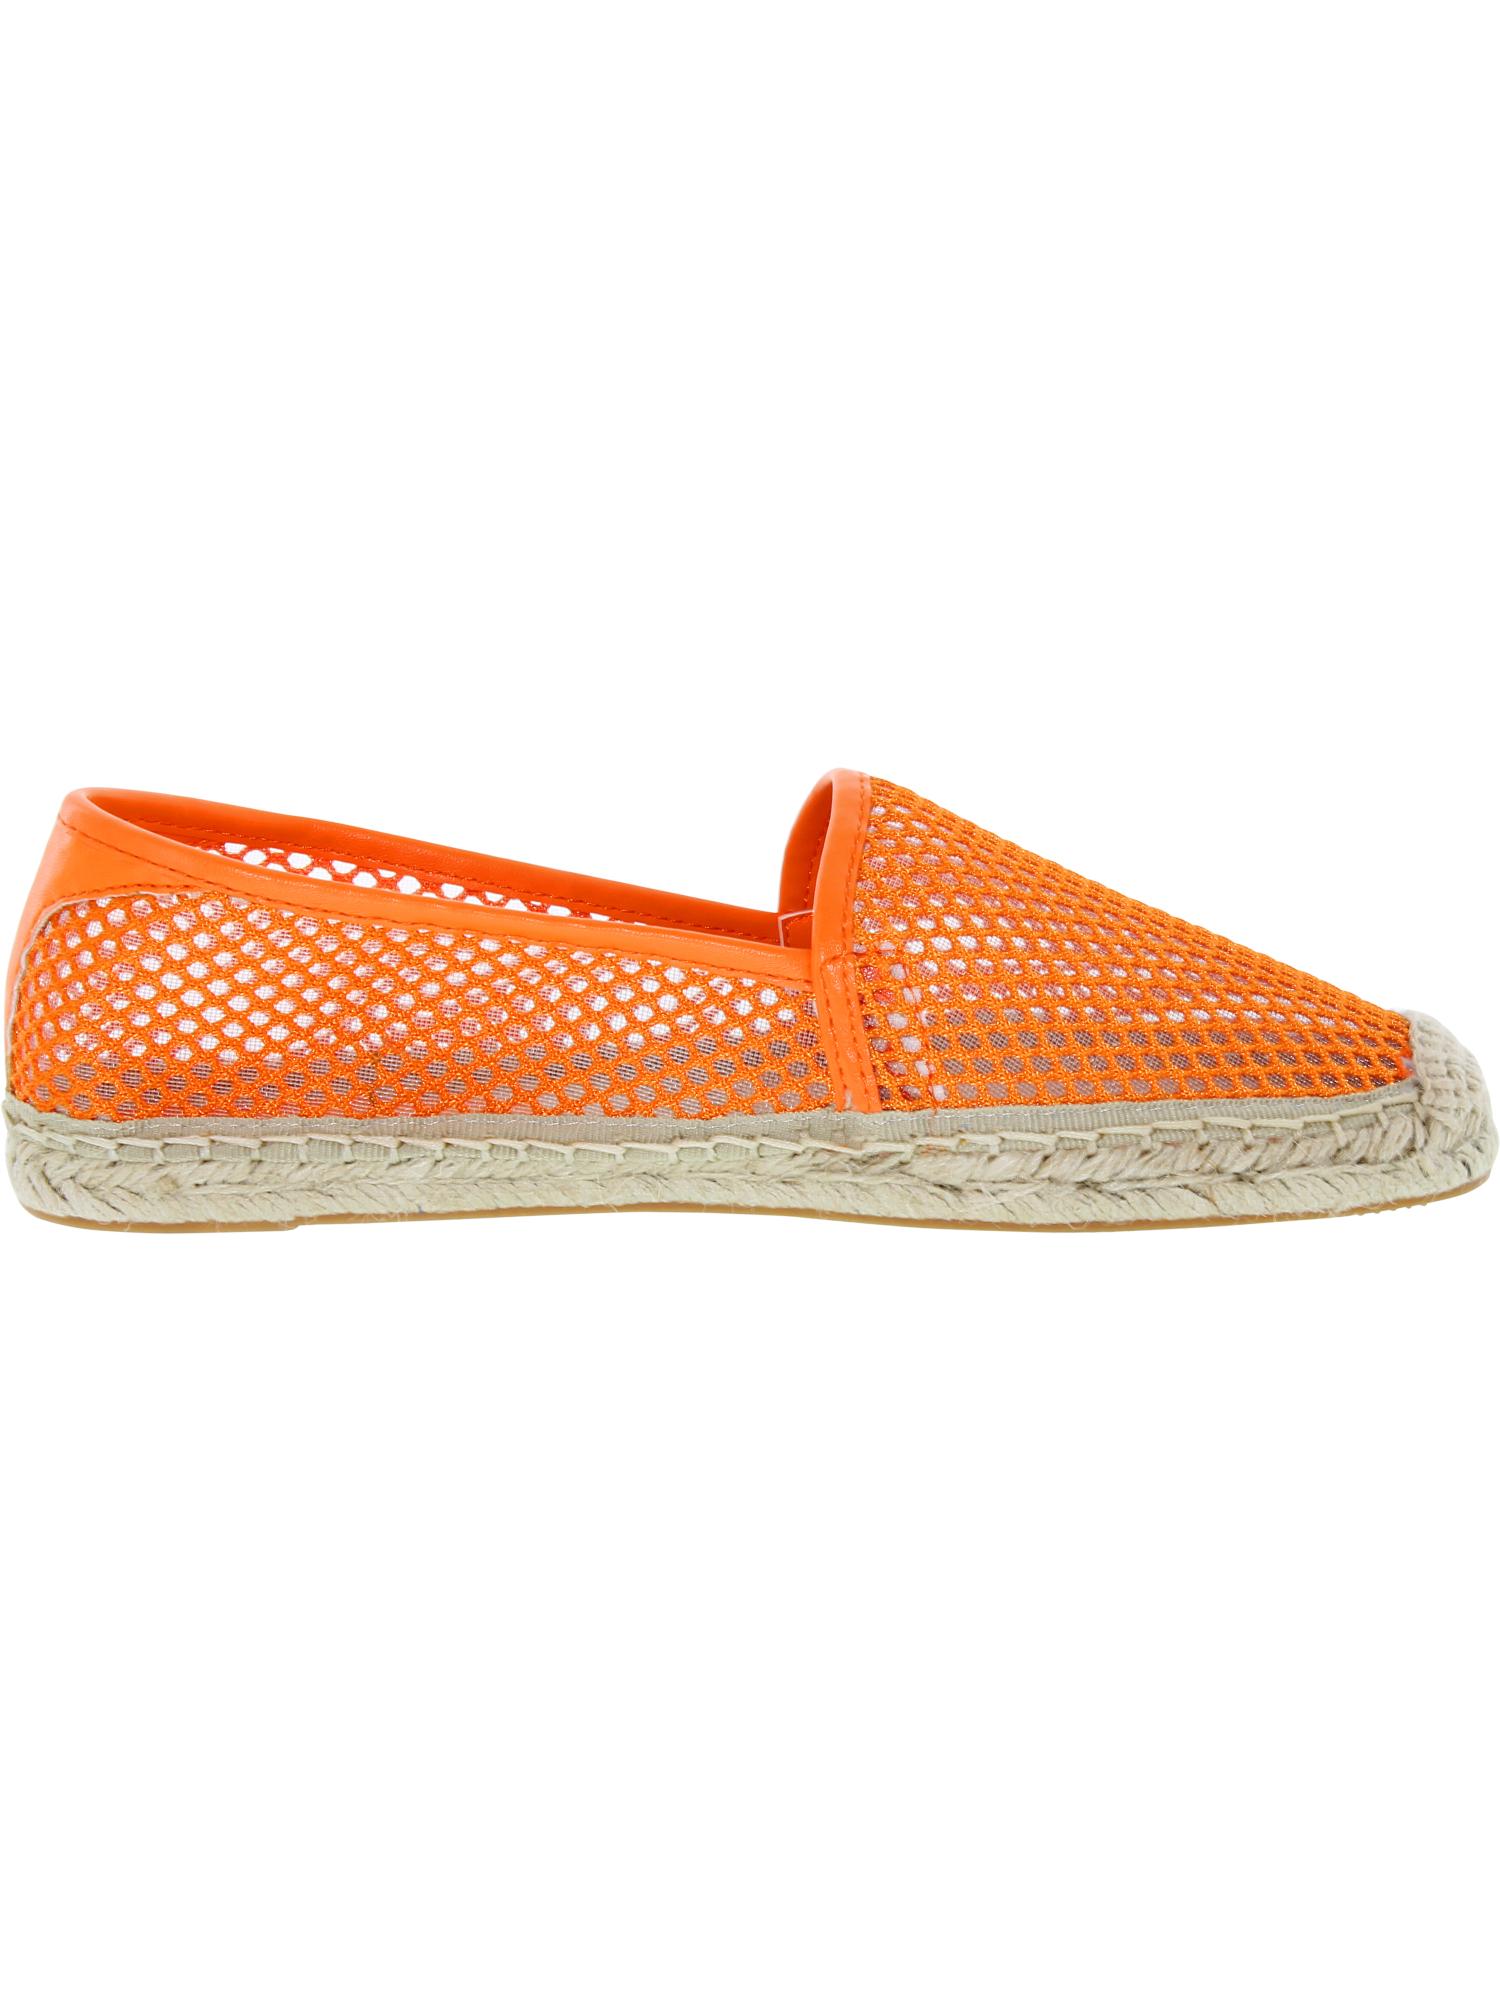 Rebecca-Minkoff-Women-039-s-Ginny-Ankle-High-Mesh-Slip-On-Shoes thumbnail 8